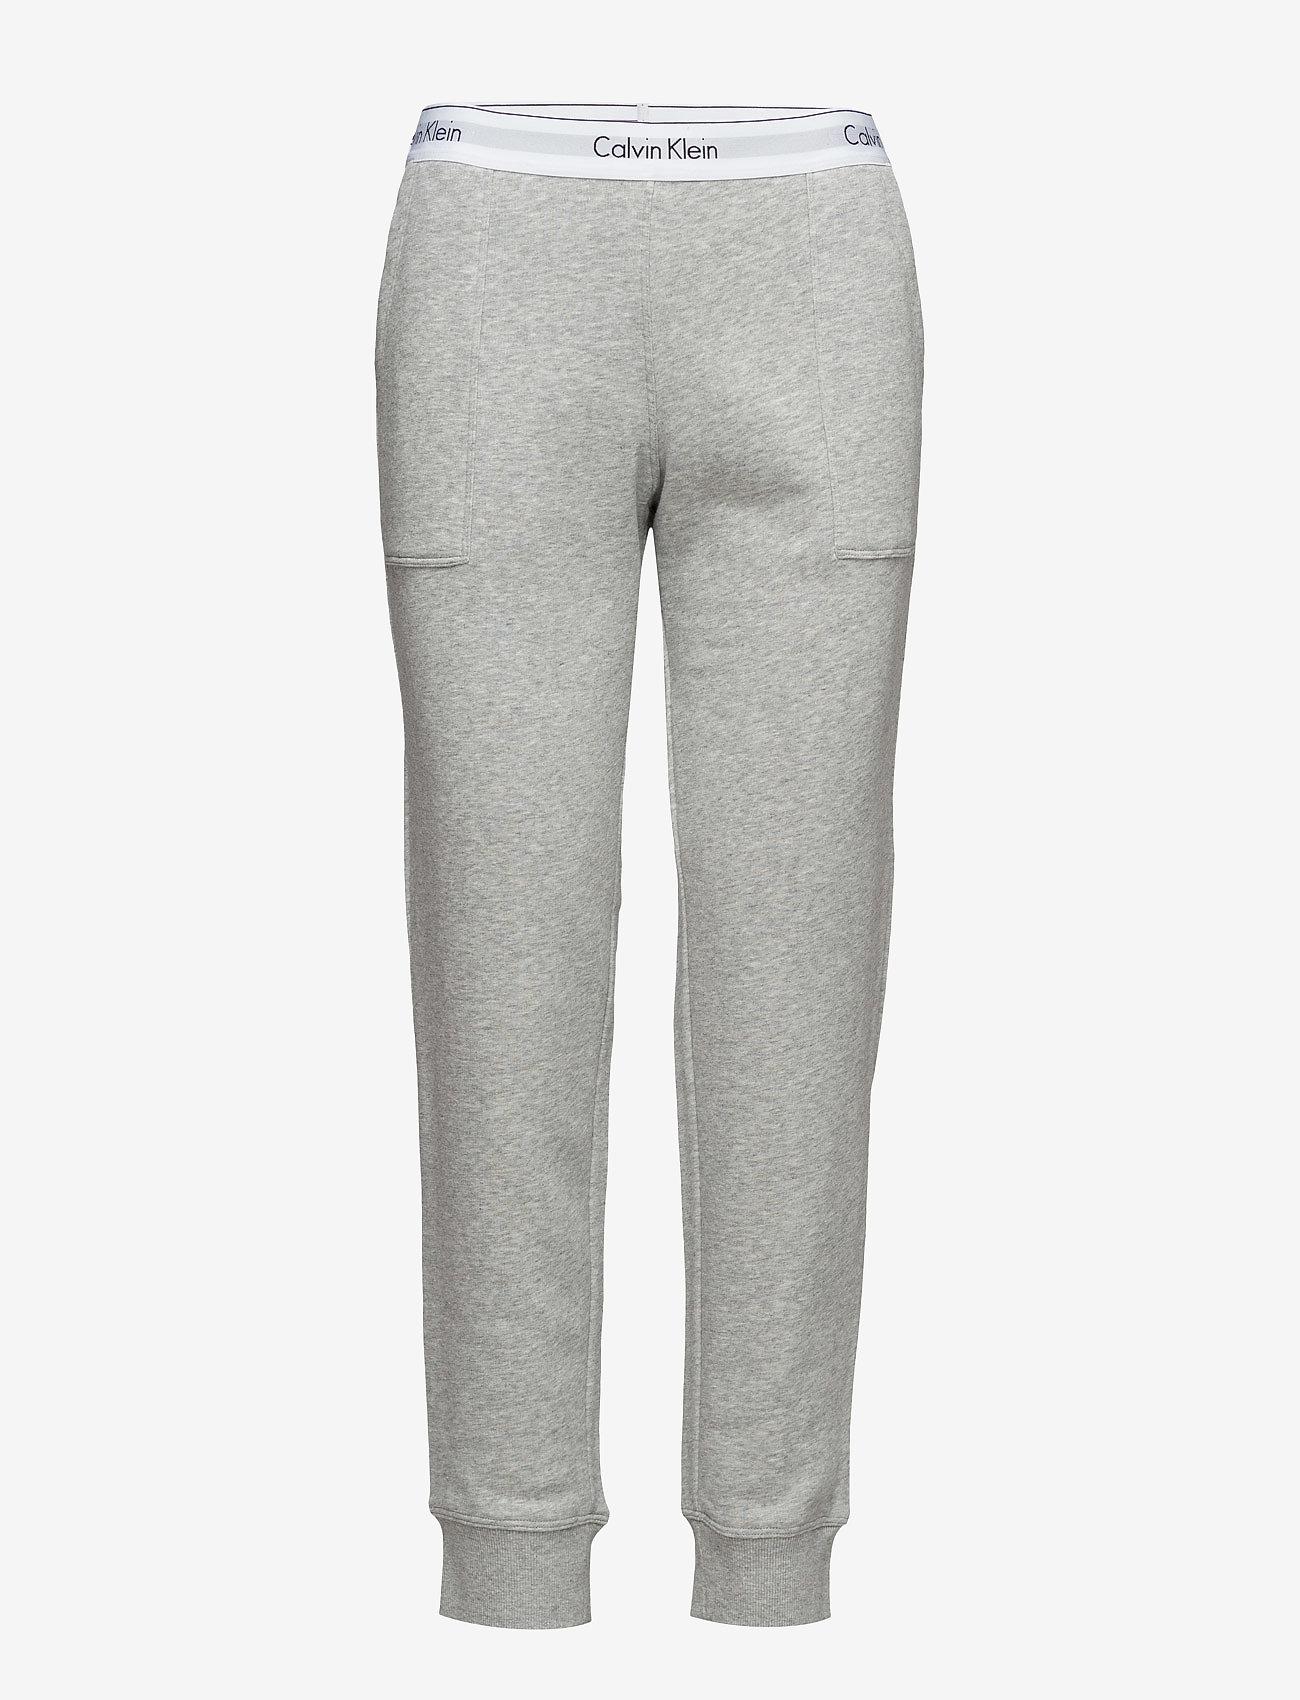 Calvin Klein - BOTTOM PANT JOGGER - doły - grey heather - 0